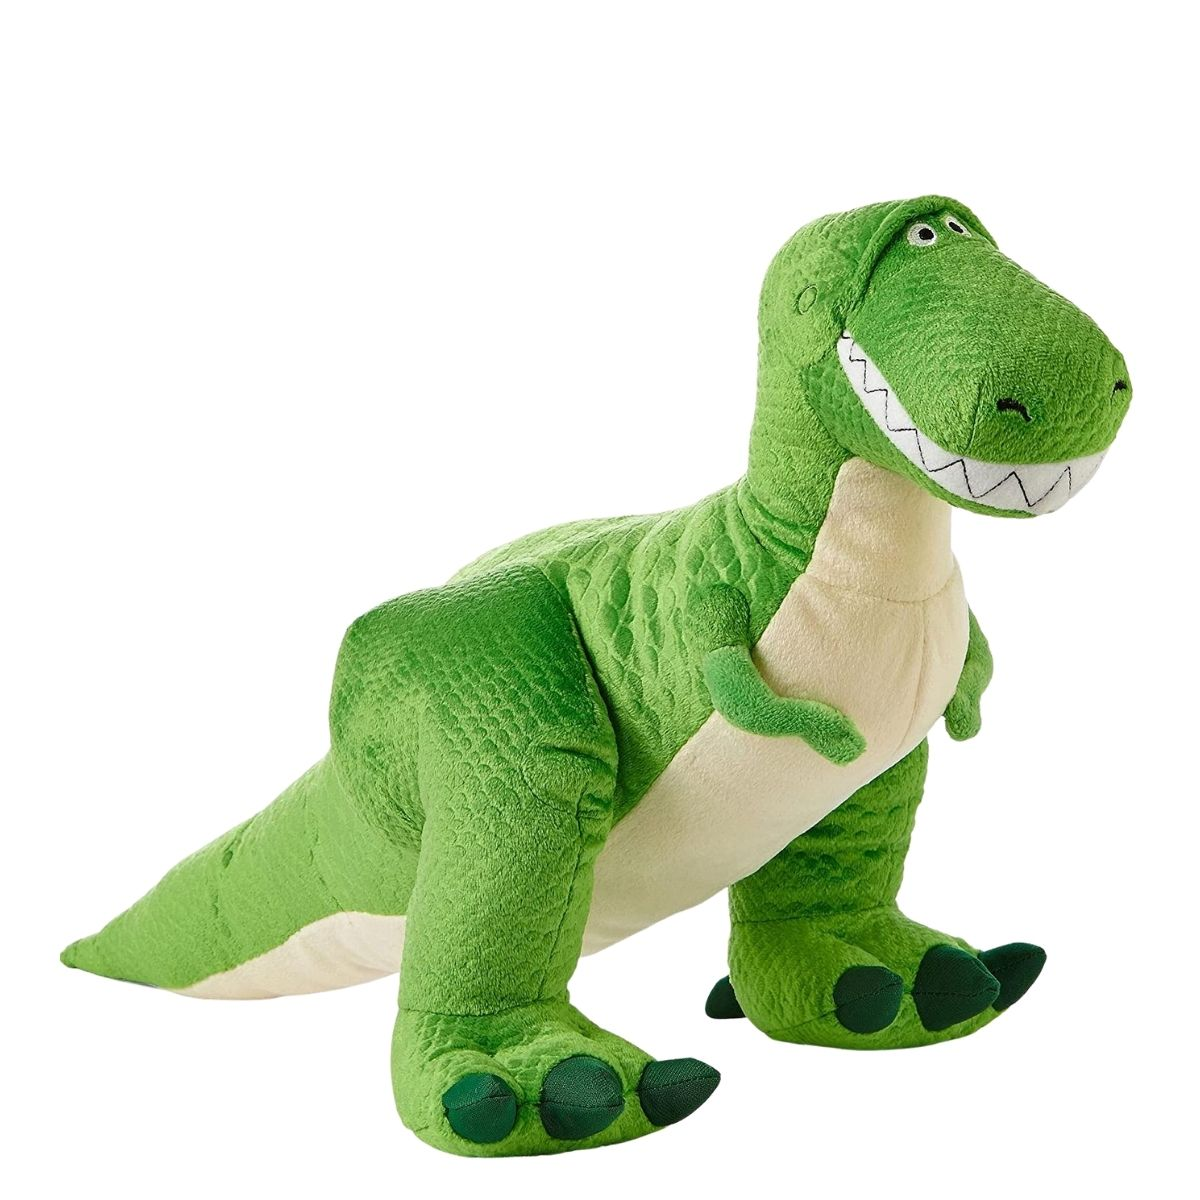 Pelucia Rex Toy Story Pelucia Disney Original   - Game Land Brinquedos